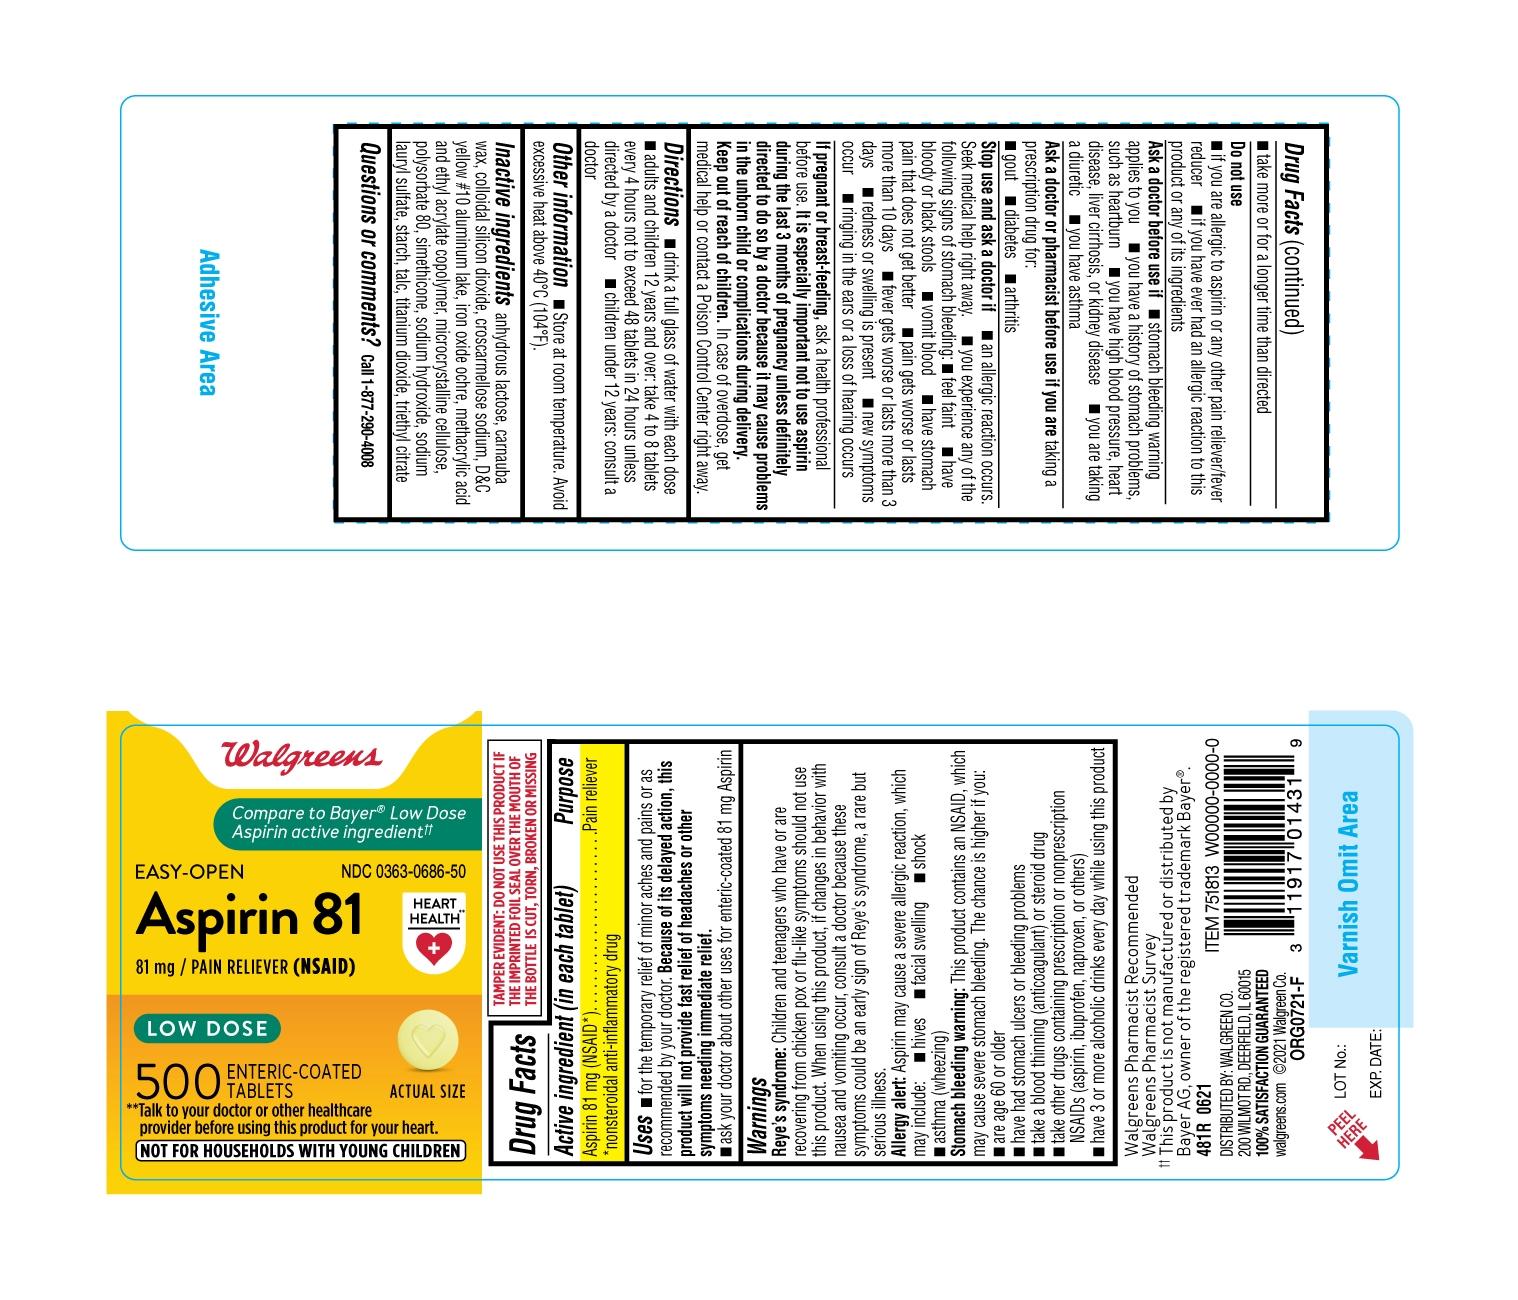 481R-Walgreens-Low Dose Aspirin-bottle label-ct500